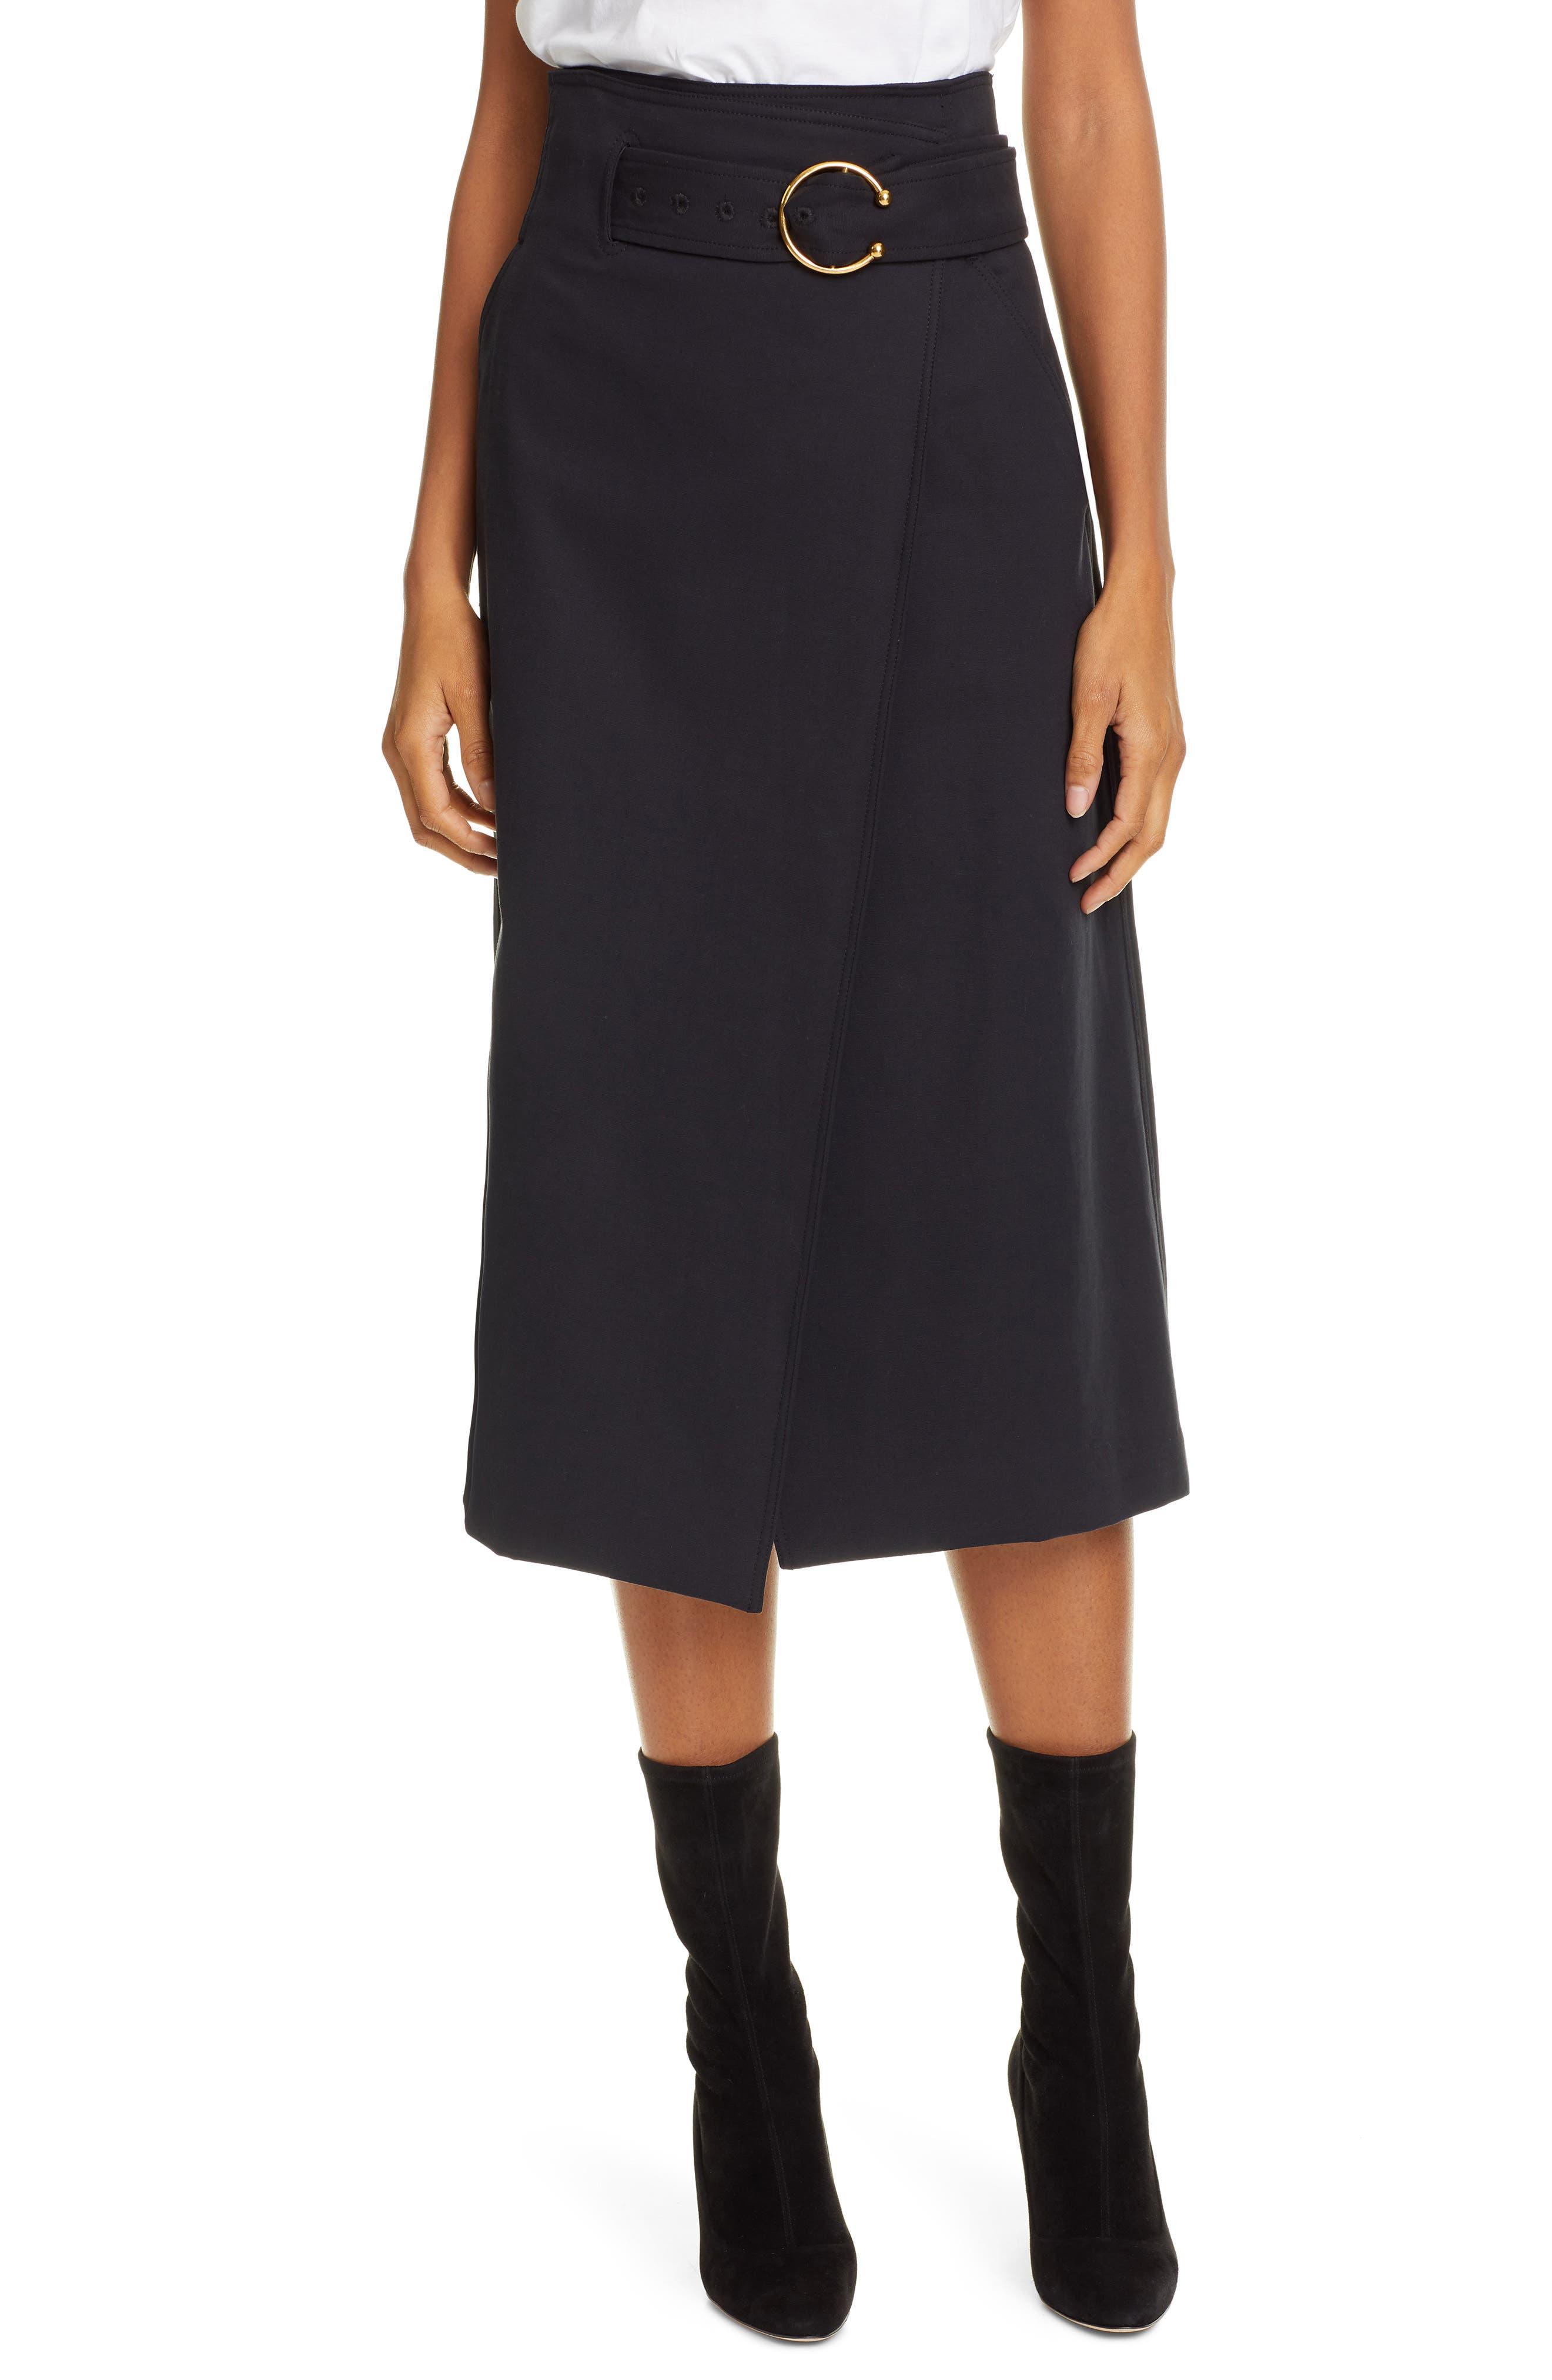 A.L.C., Aldridge Belted Midi Skirt, Main thumbnail 1, color, VINTAGE BLACK